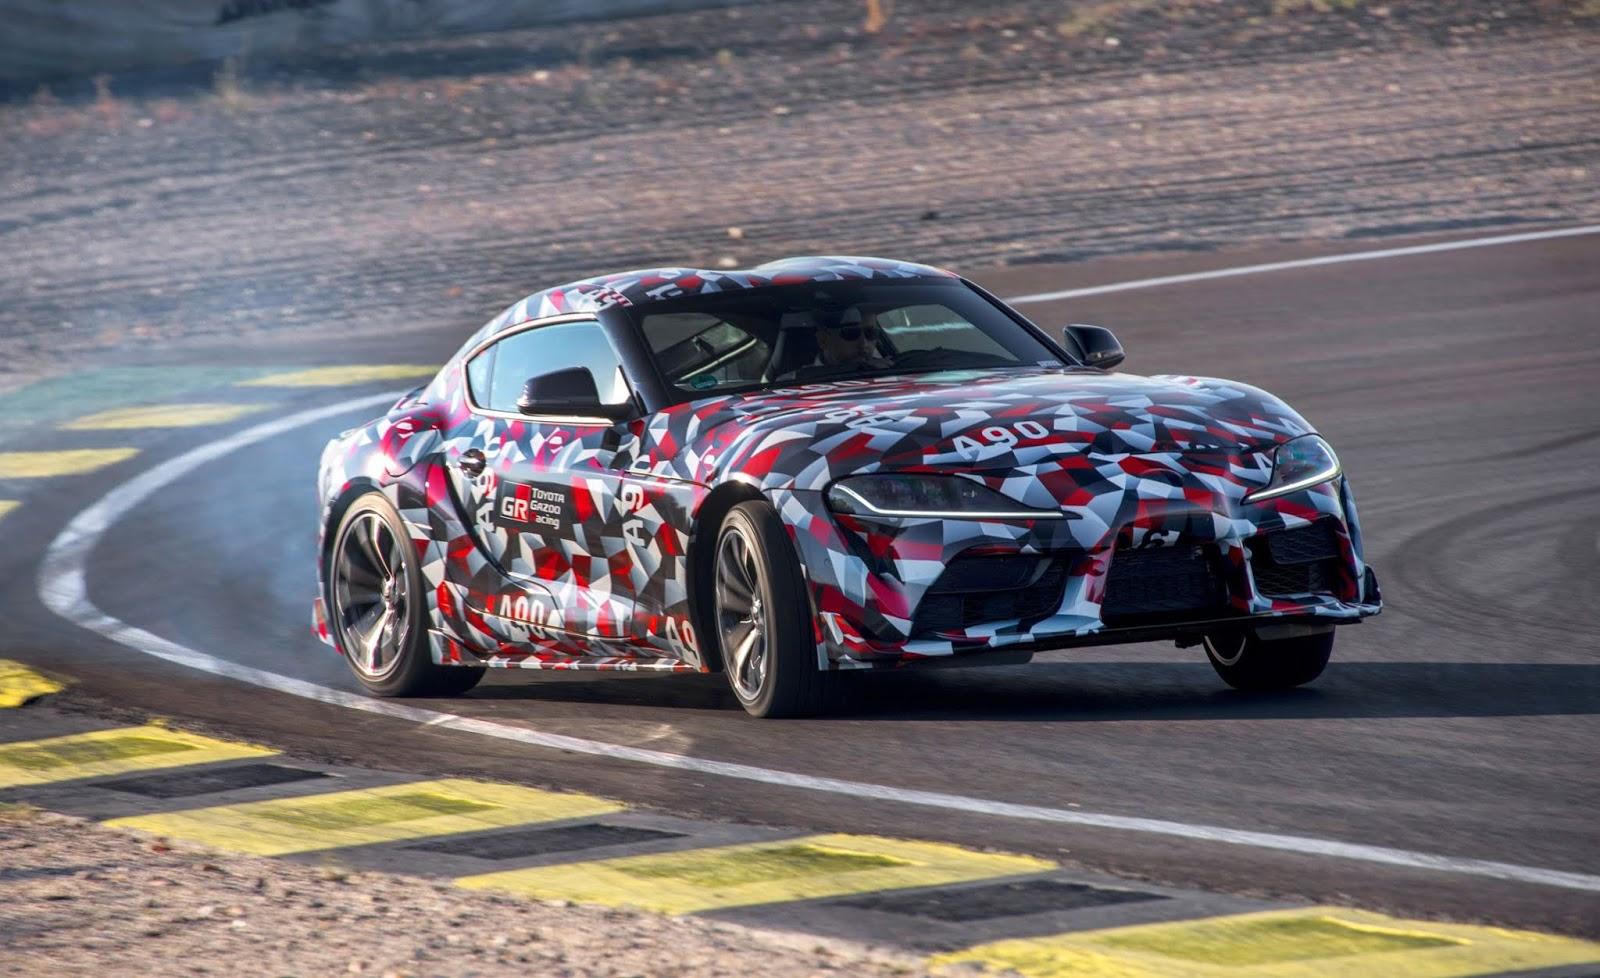 toy2 Άκου τον 3λιτρο της νέας Supra να ουρλιάζει! BMW, Toyota, Toyota Supra, video, videos, zblog